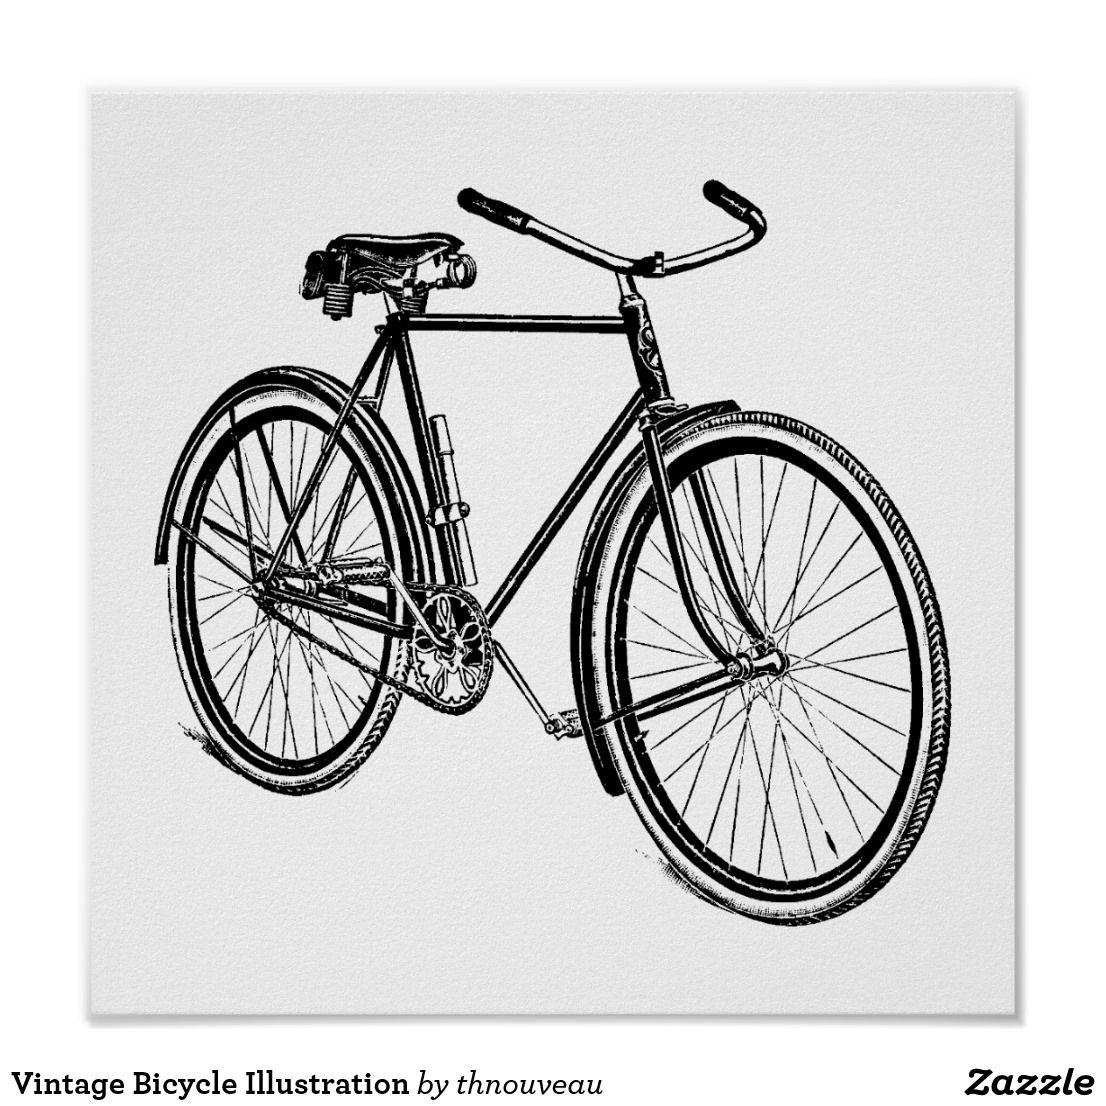 Vintage Bicycle Illustration Poster Zazzle Com In 2020 Bicycle Illustration Vintage Bicycles Bicycle